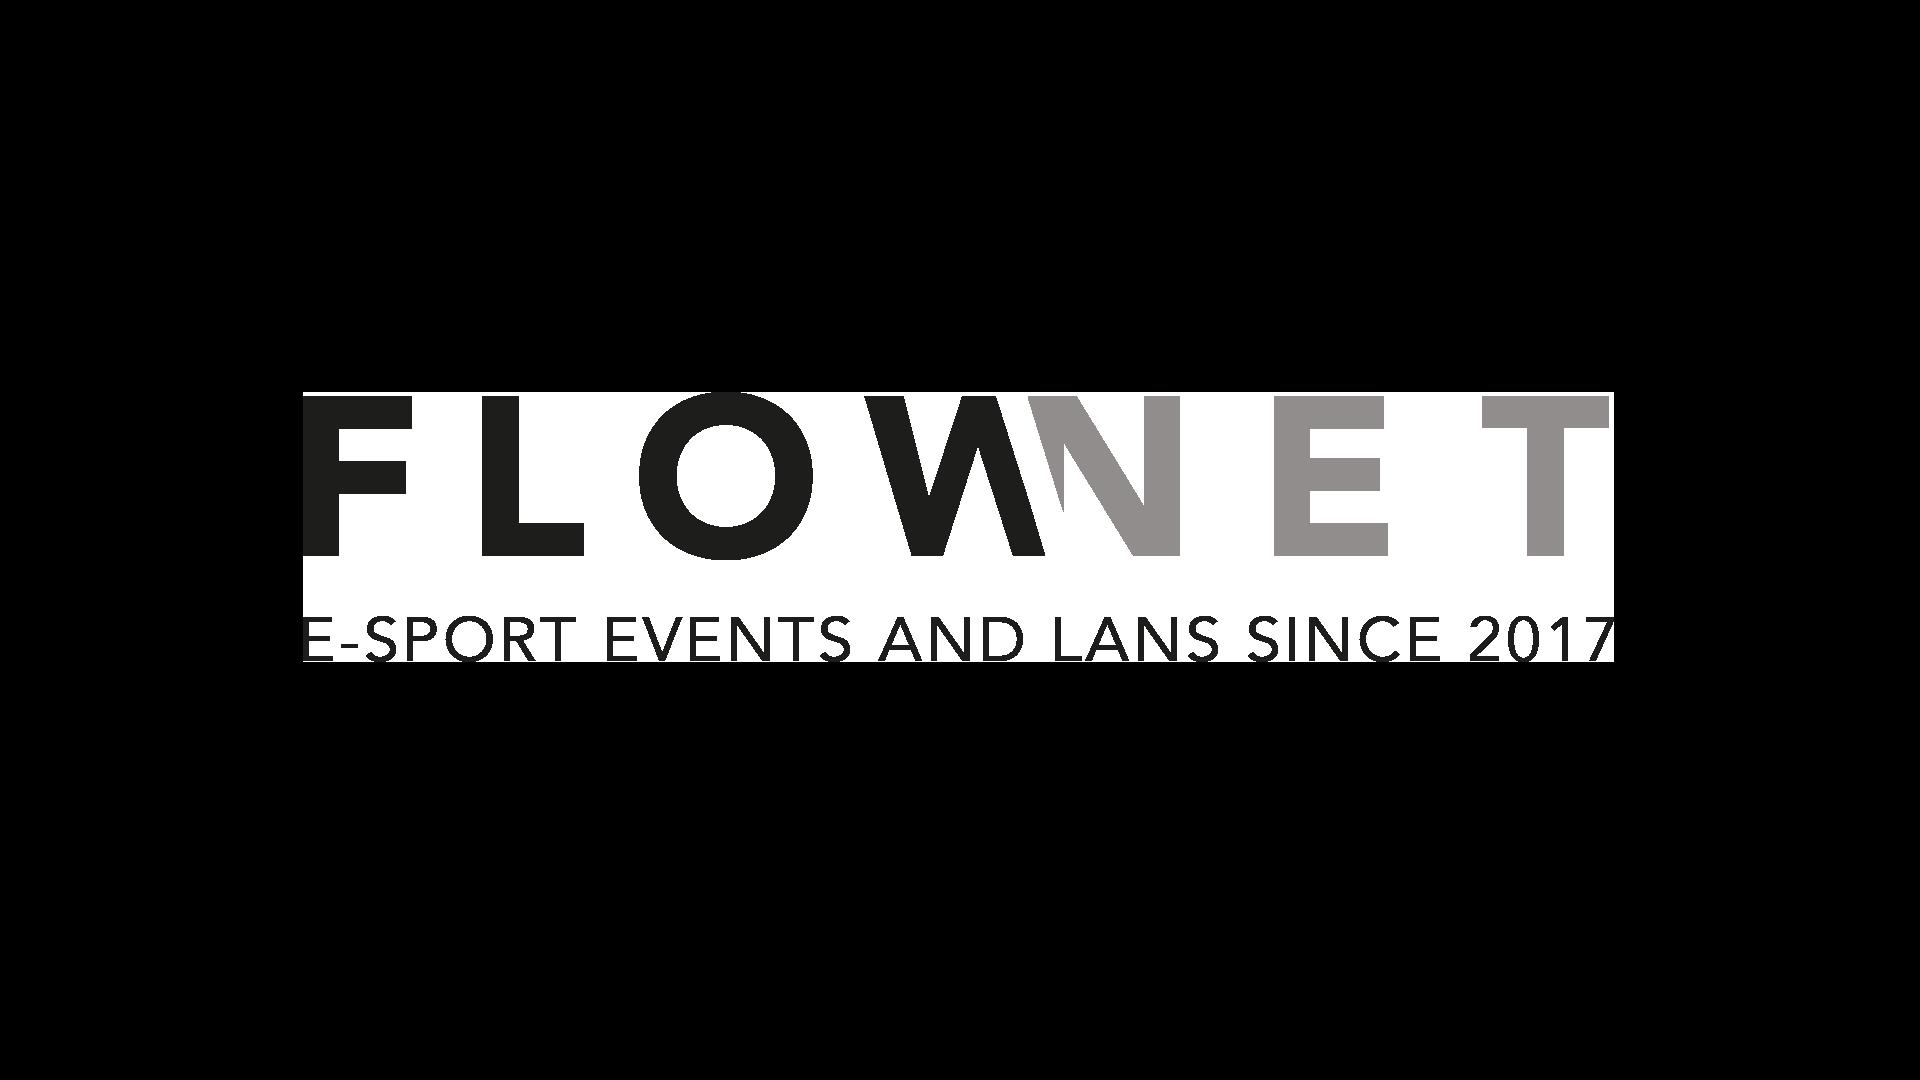 FLOWNET,transparantbakgrund